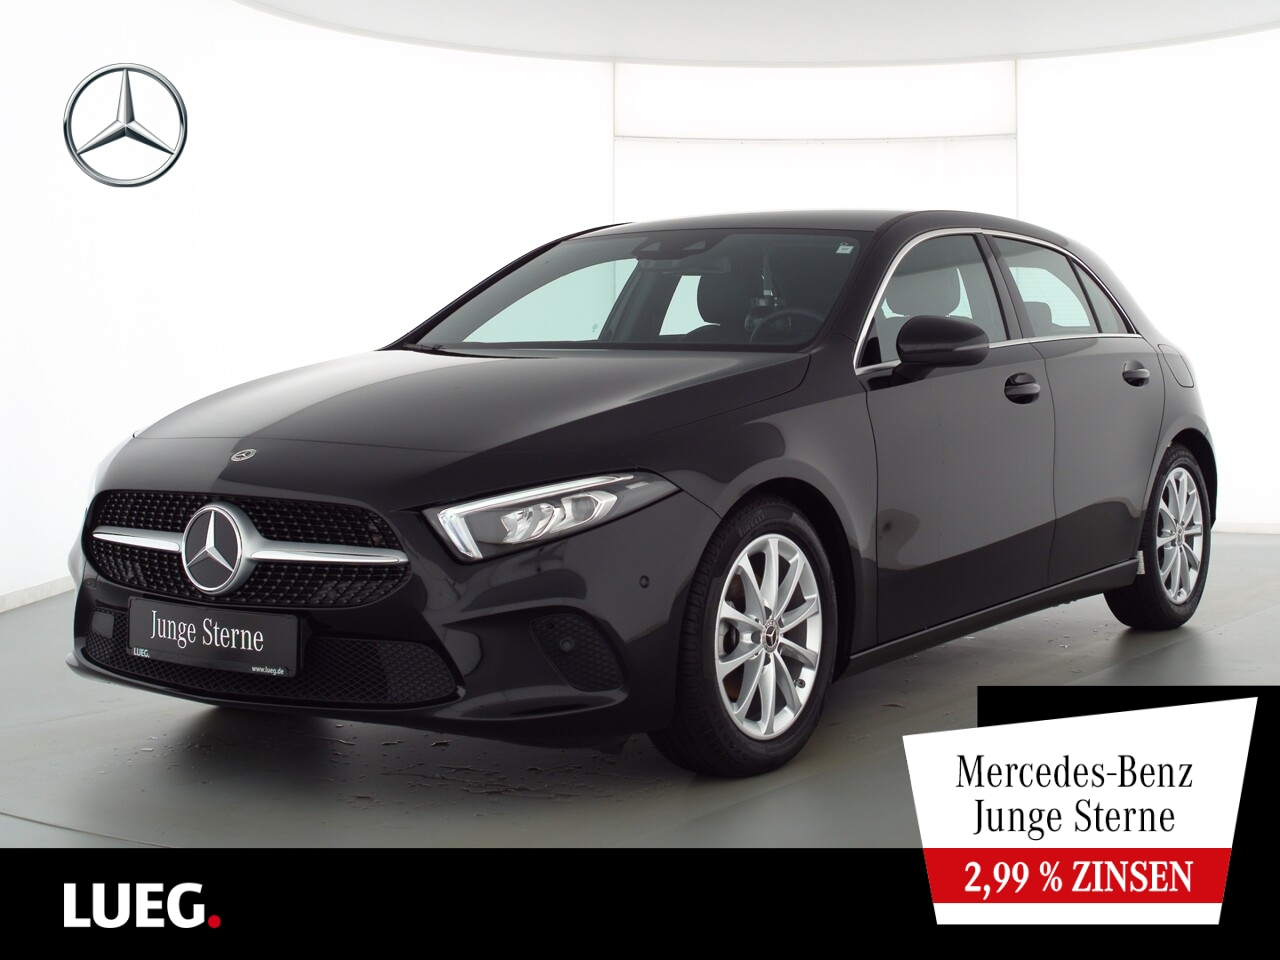 Mercedes-Benz A 180 Progressive+MBUXHighEnd+LED-HP+Park-Assist, Jahr 2020, Benzin